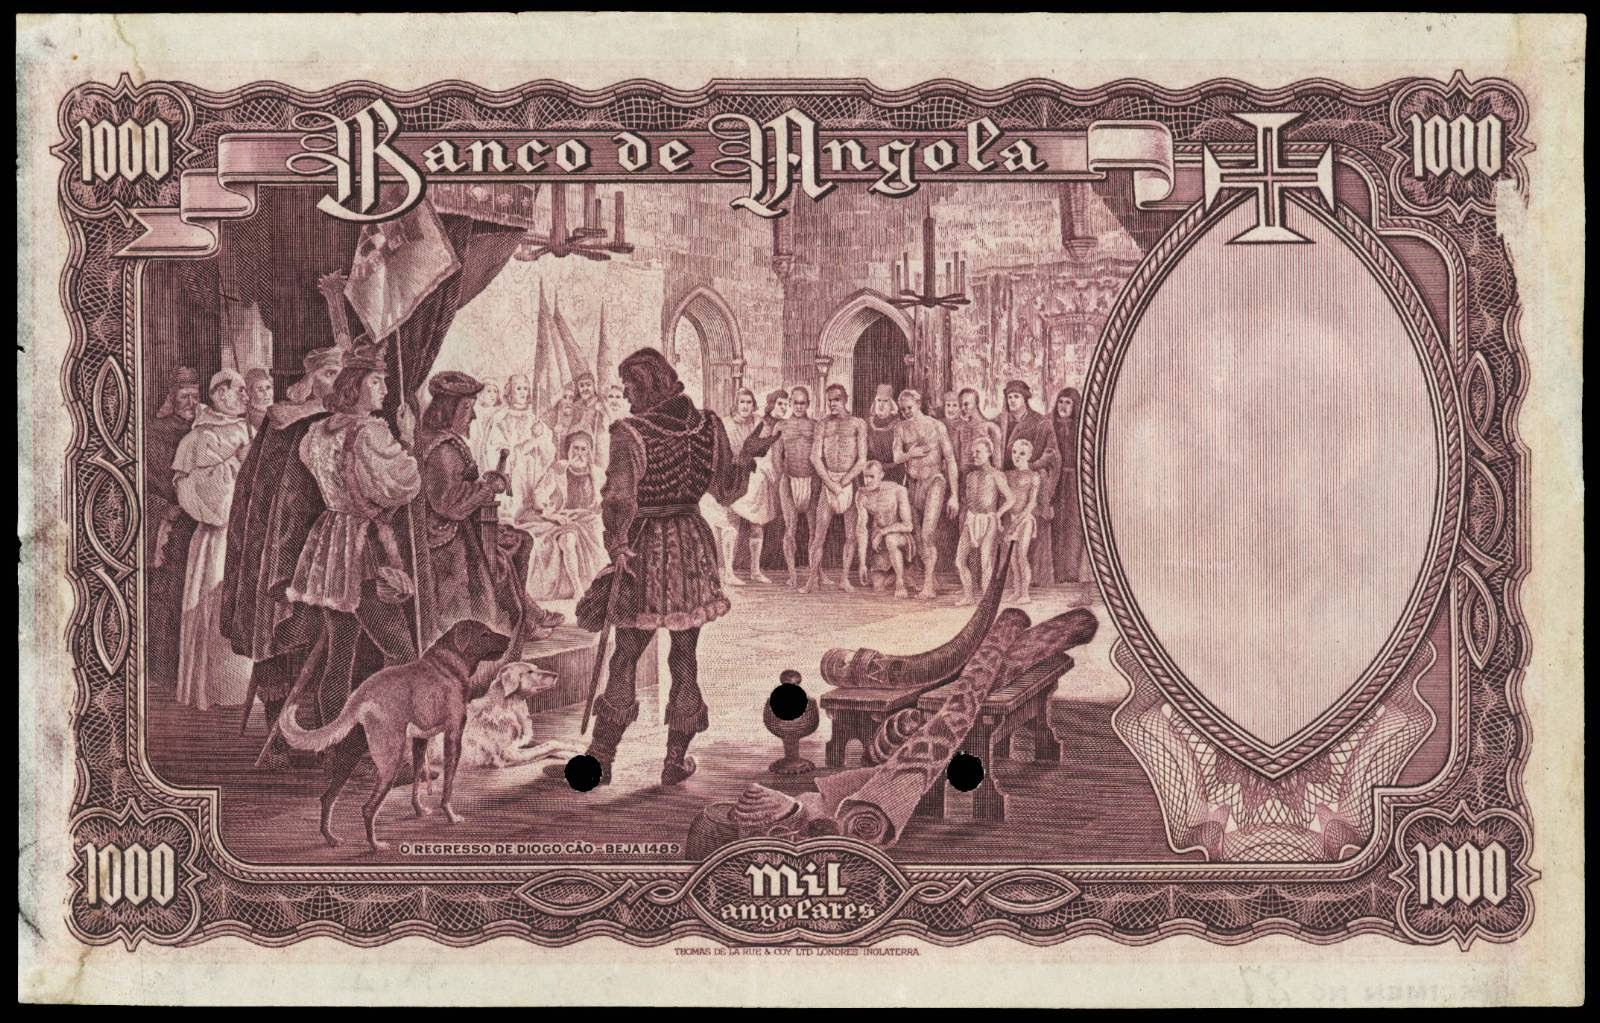 1000 Angolares banknote 1944 Diogo Cao